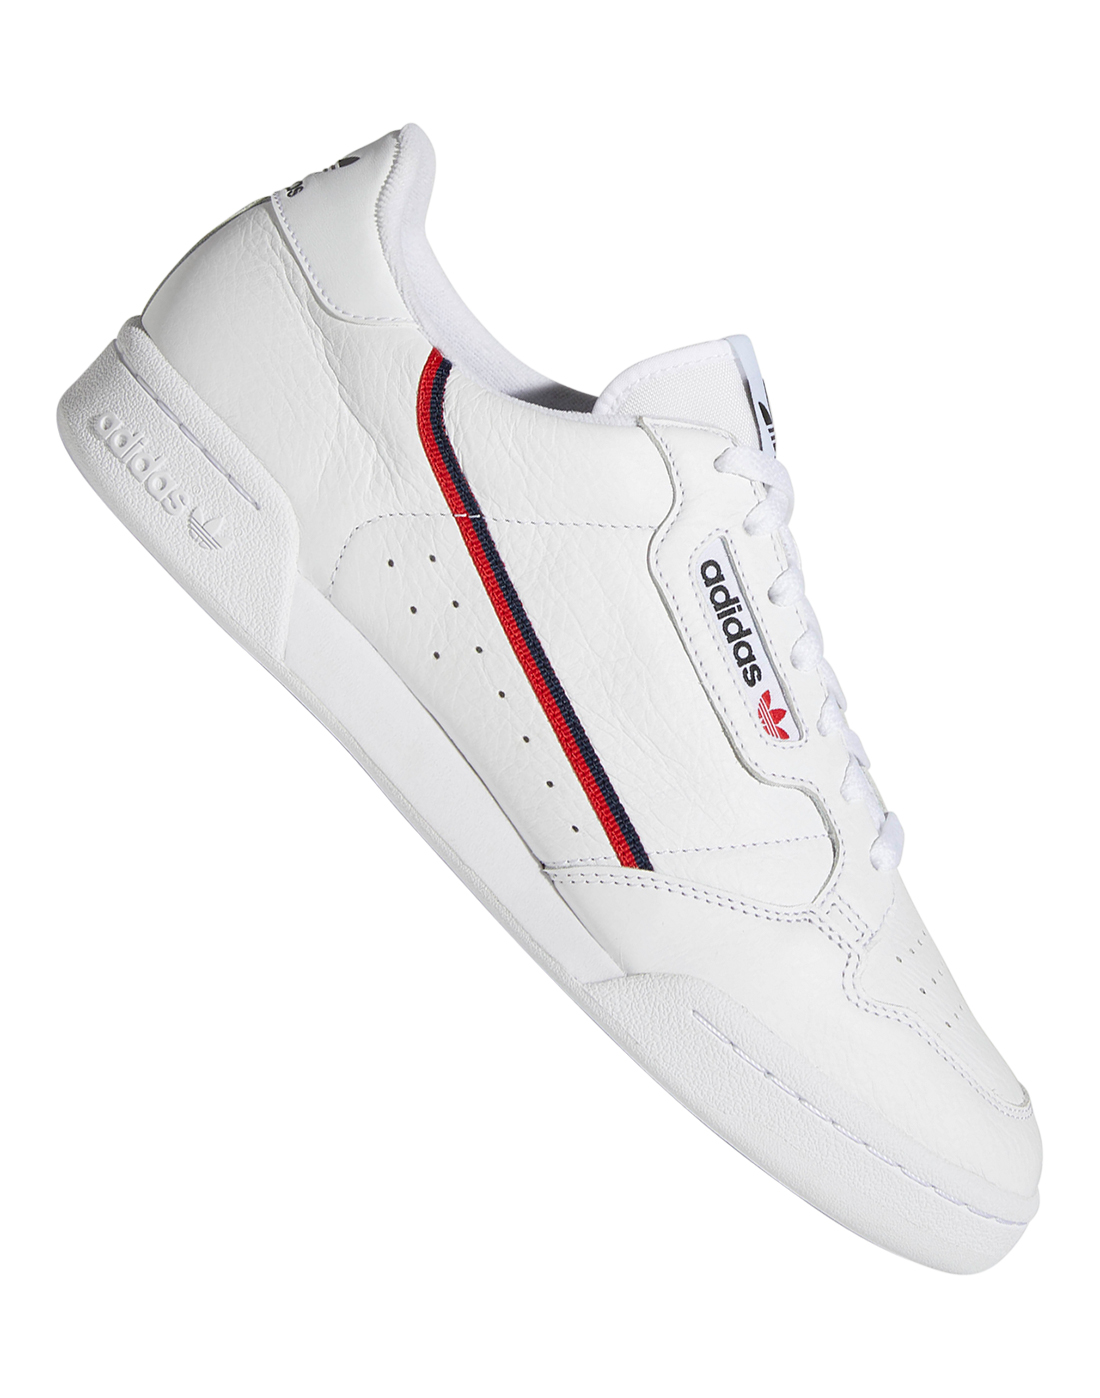 737ad1f895 adidas Originals. Womens Continental 80. Womens Continental 80 ...